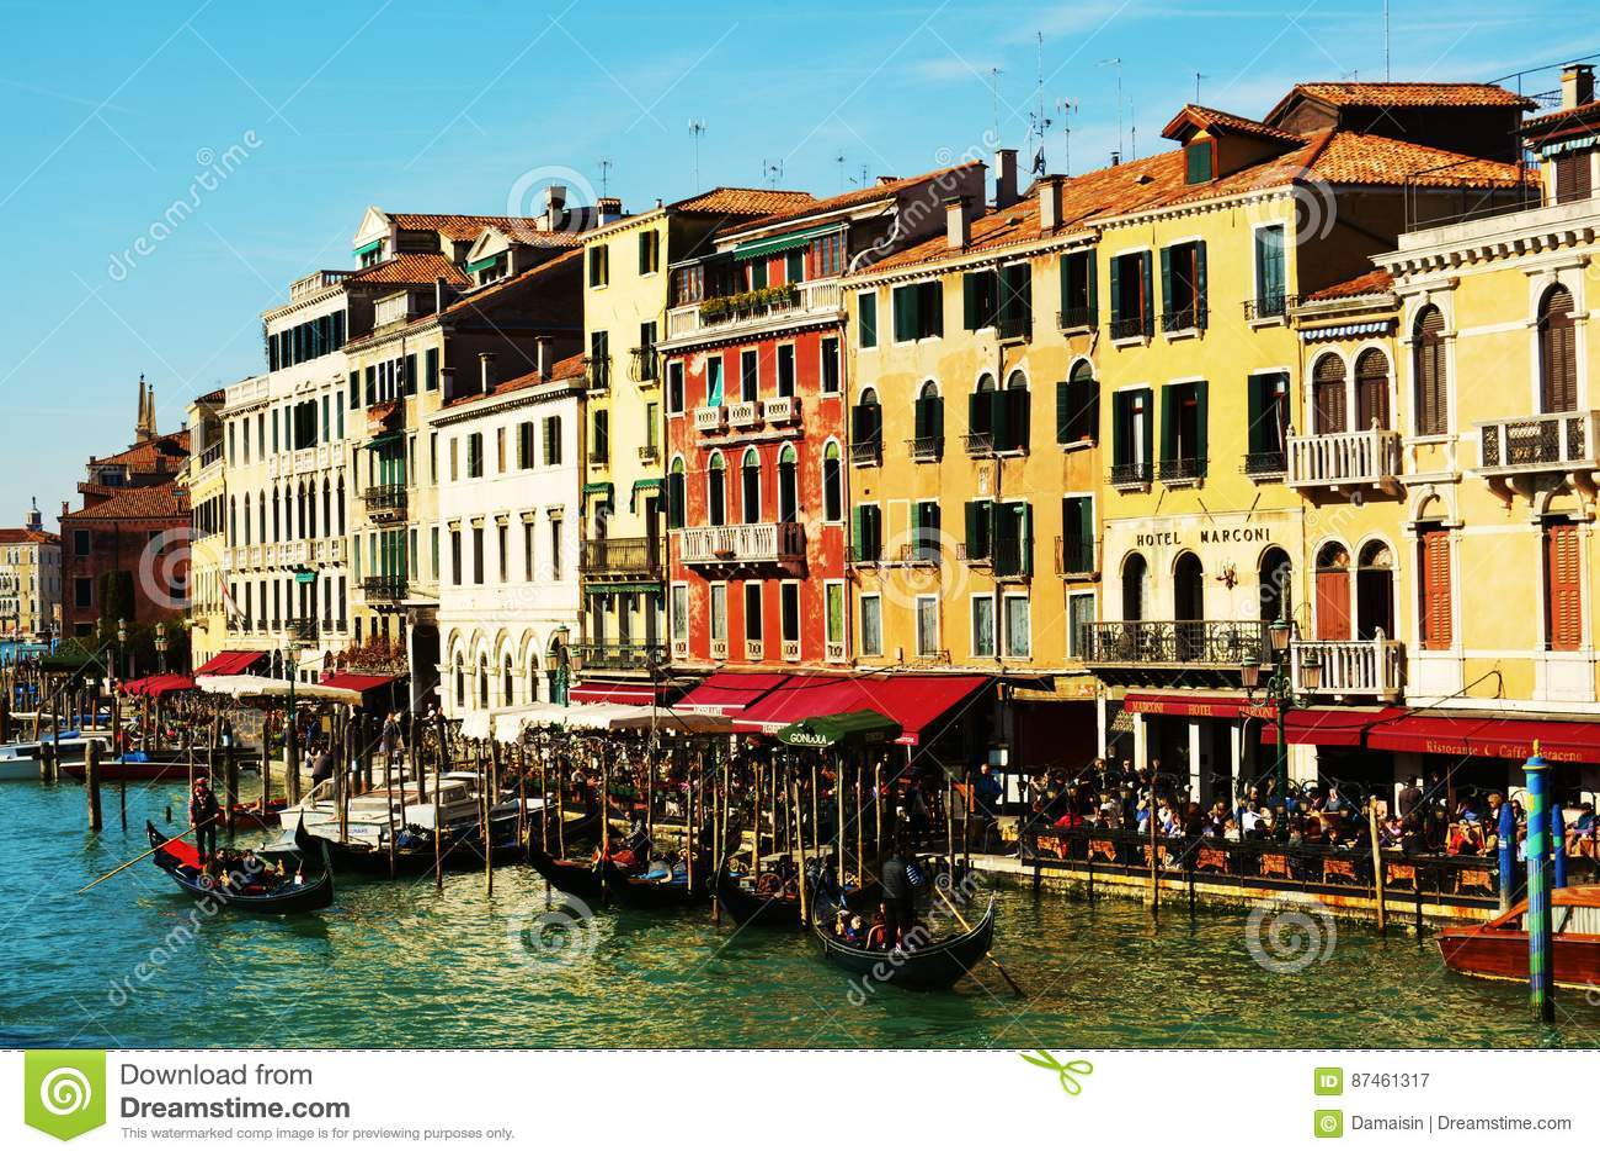 Gondels, kleurrijke architectuur, Grand Canal, Venetië, Italië, Europa